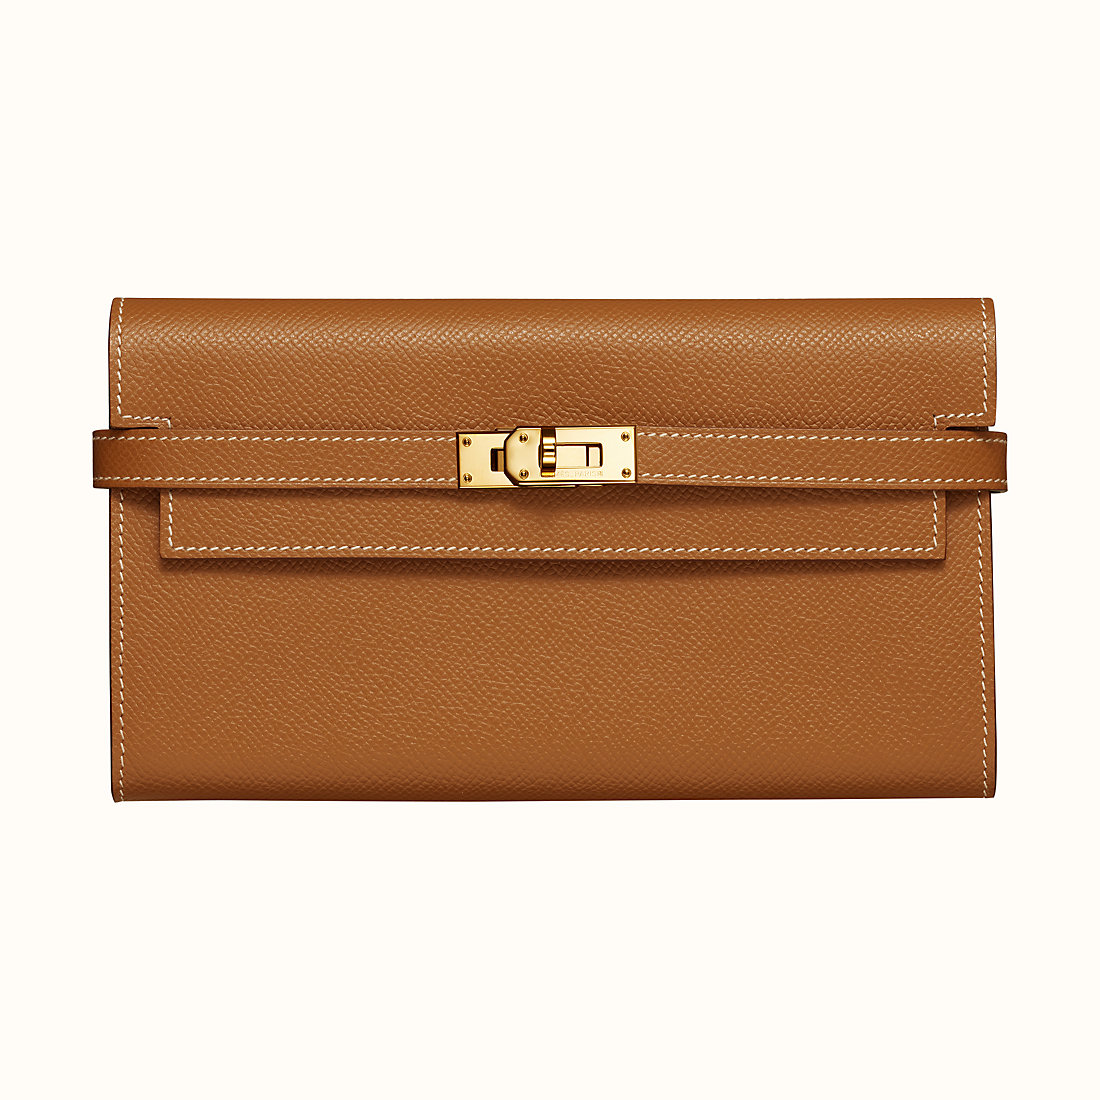 臺灣高雄市愛馬仕 Hermes Kelly classic wallet CC37 Gold 金棕色 Epsom